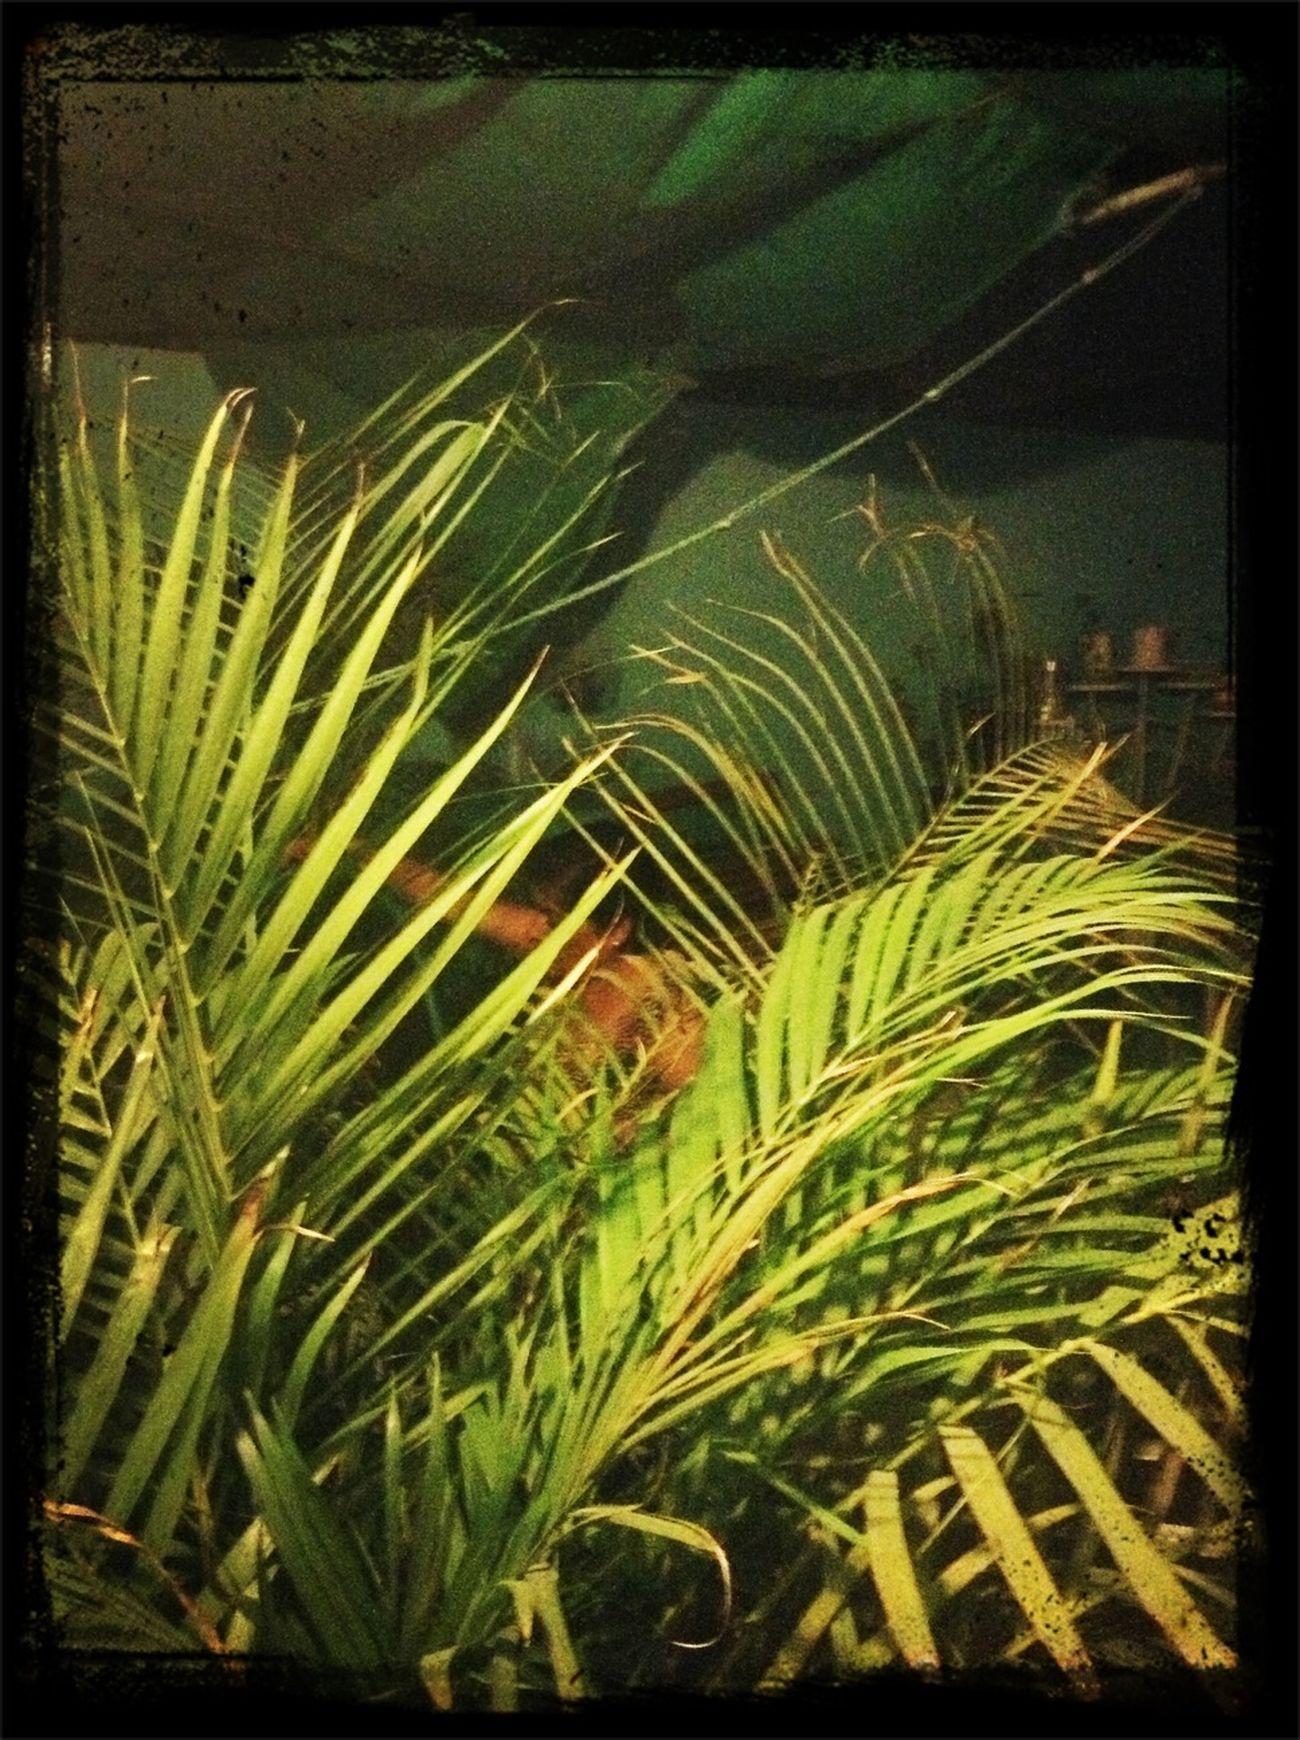 Mi ama en la jungla!